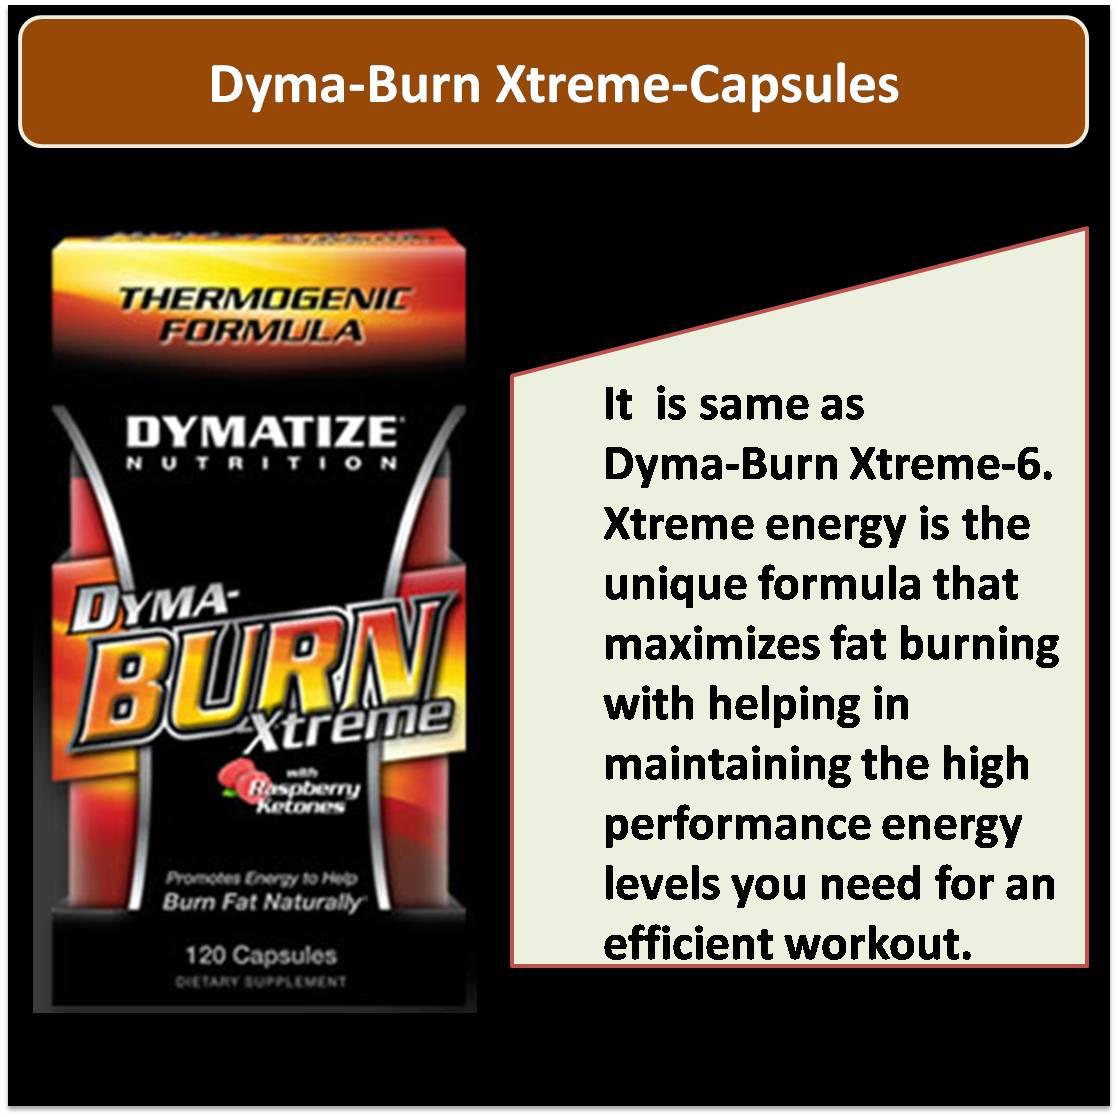 Dyma-Burn Xtreme-Capsules